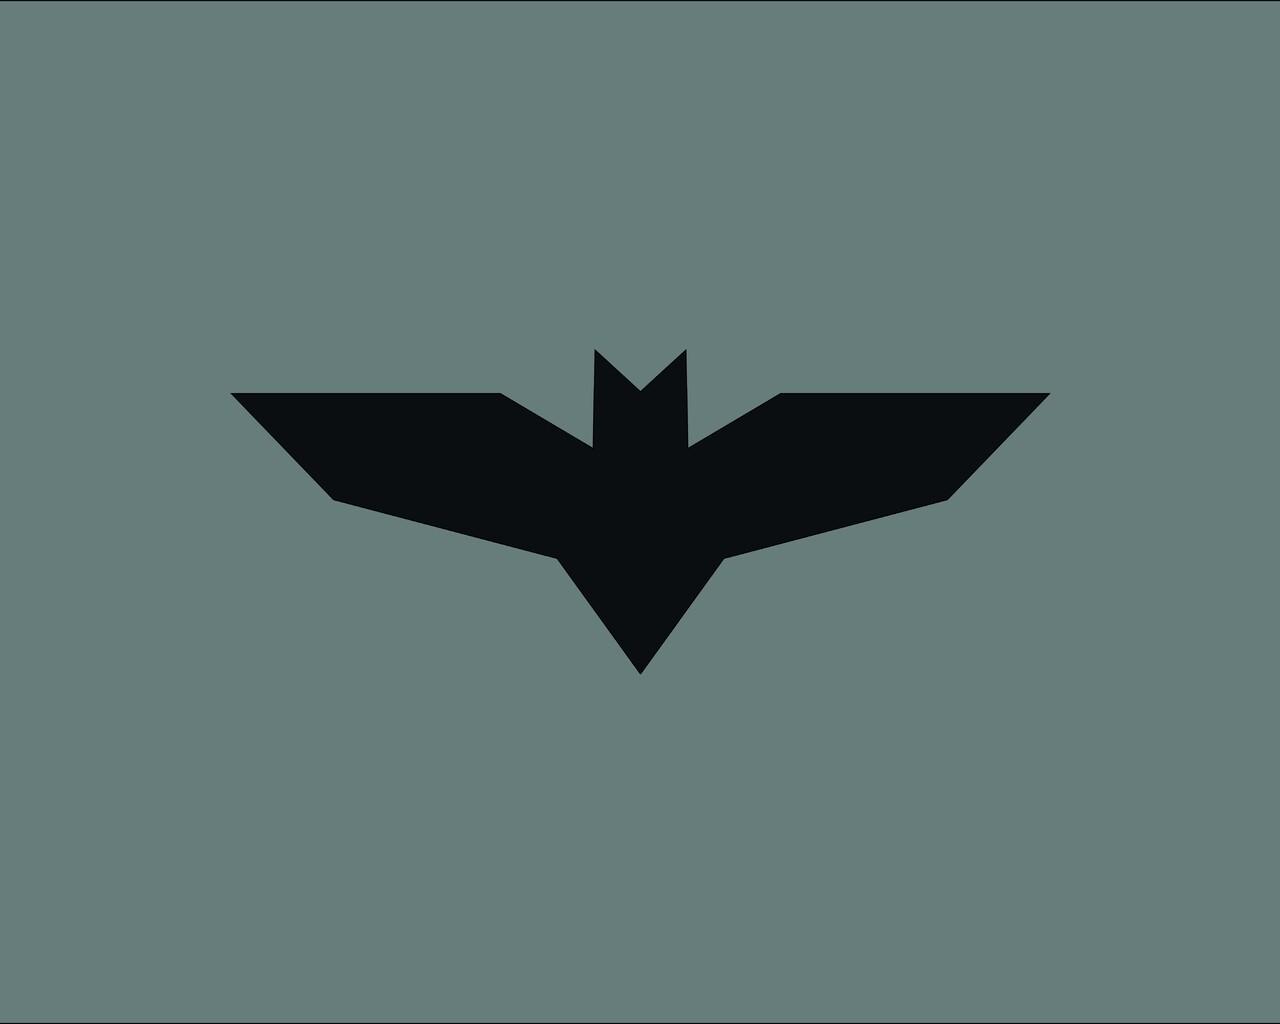 batman-justice-league-logo-minimalism-sd.jpg